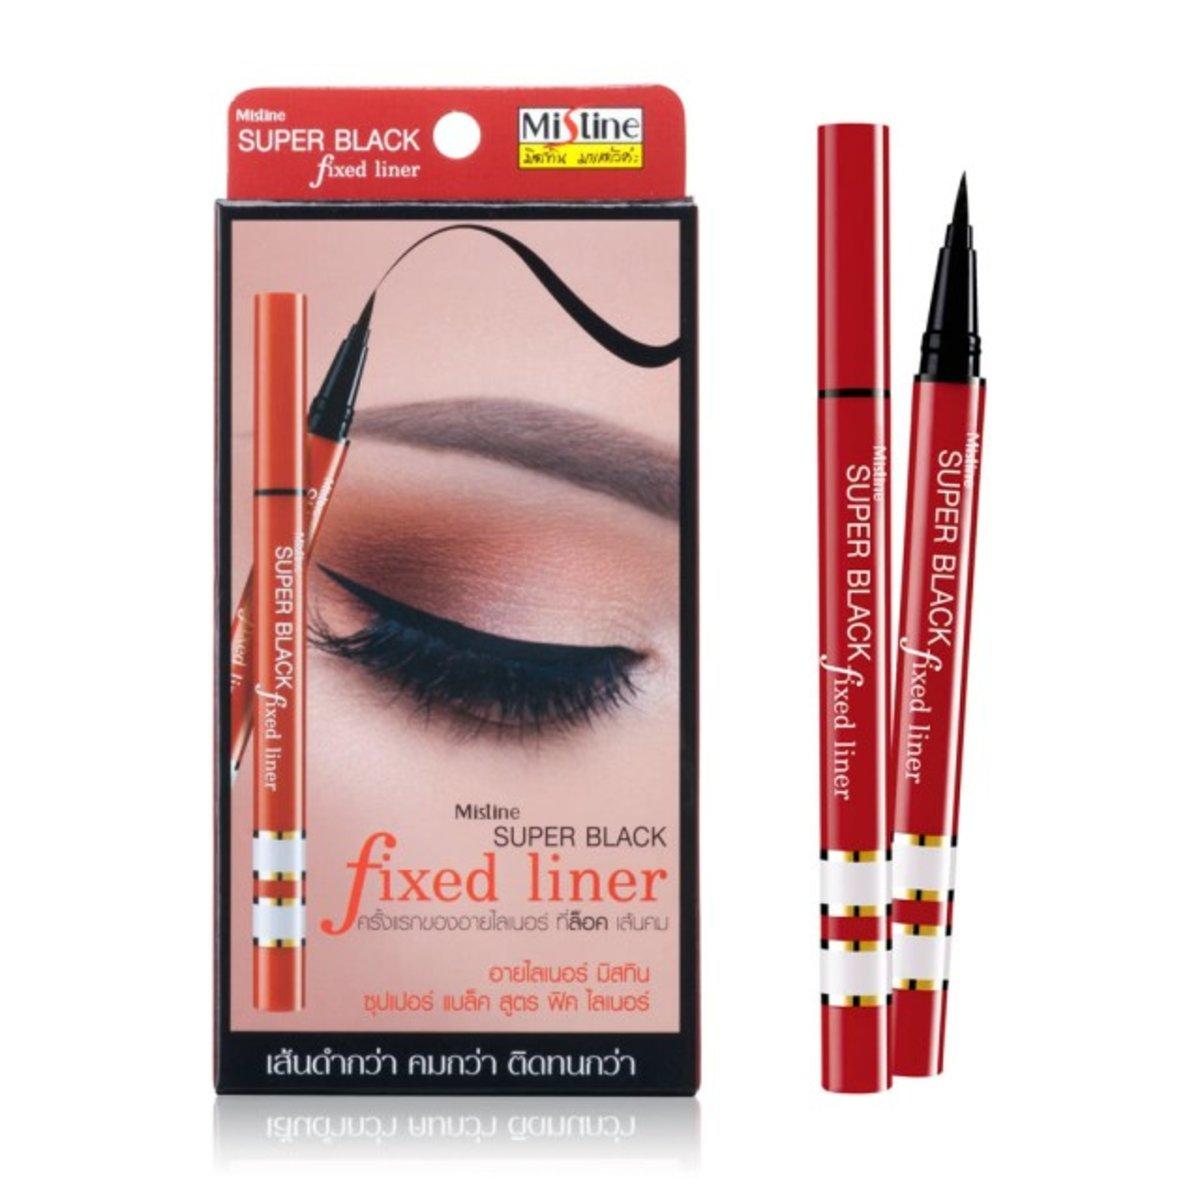 泰國 Mistine Mistine Super Black Fixed Liner 紅管超激黑眼線液筆 1g  紅色